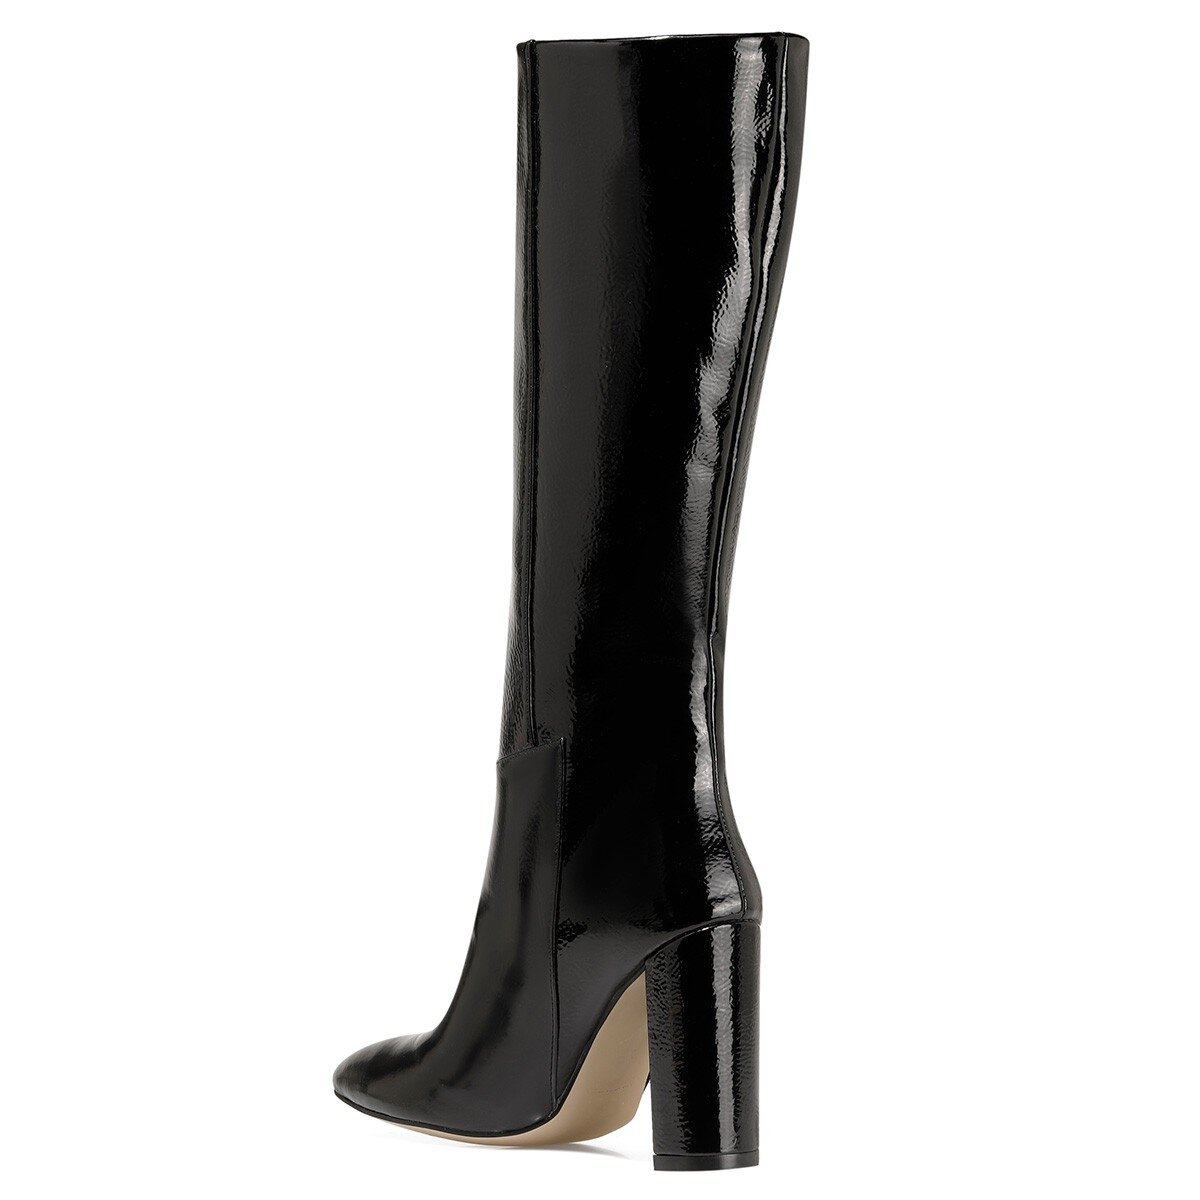 MIMA Siyah Kadın Topuklu Çizme